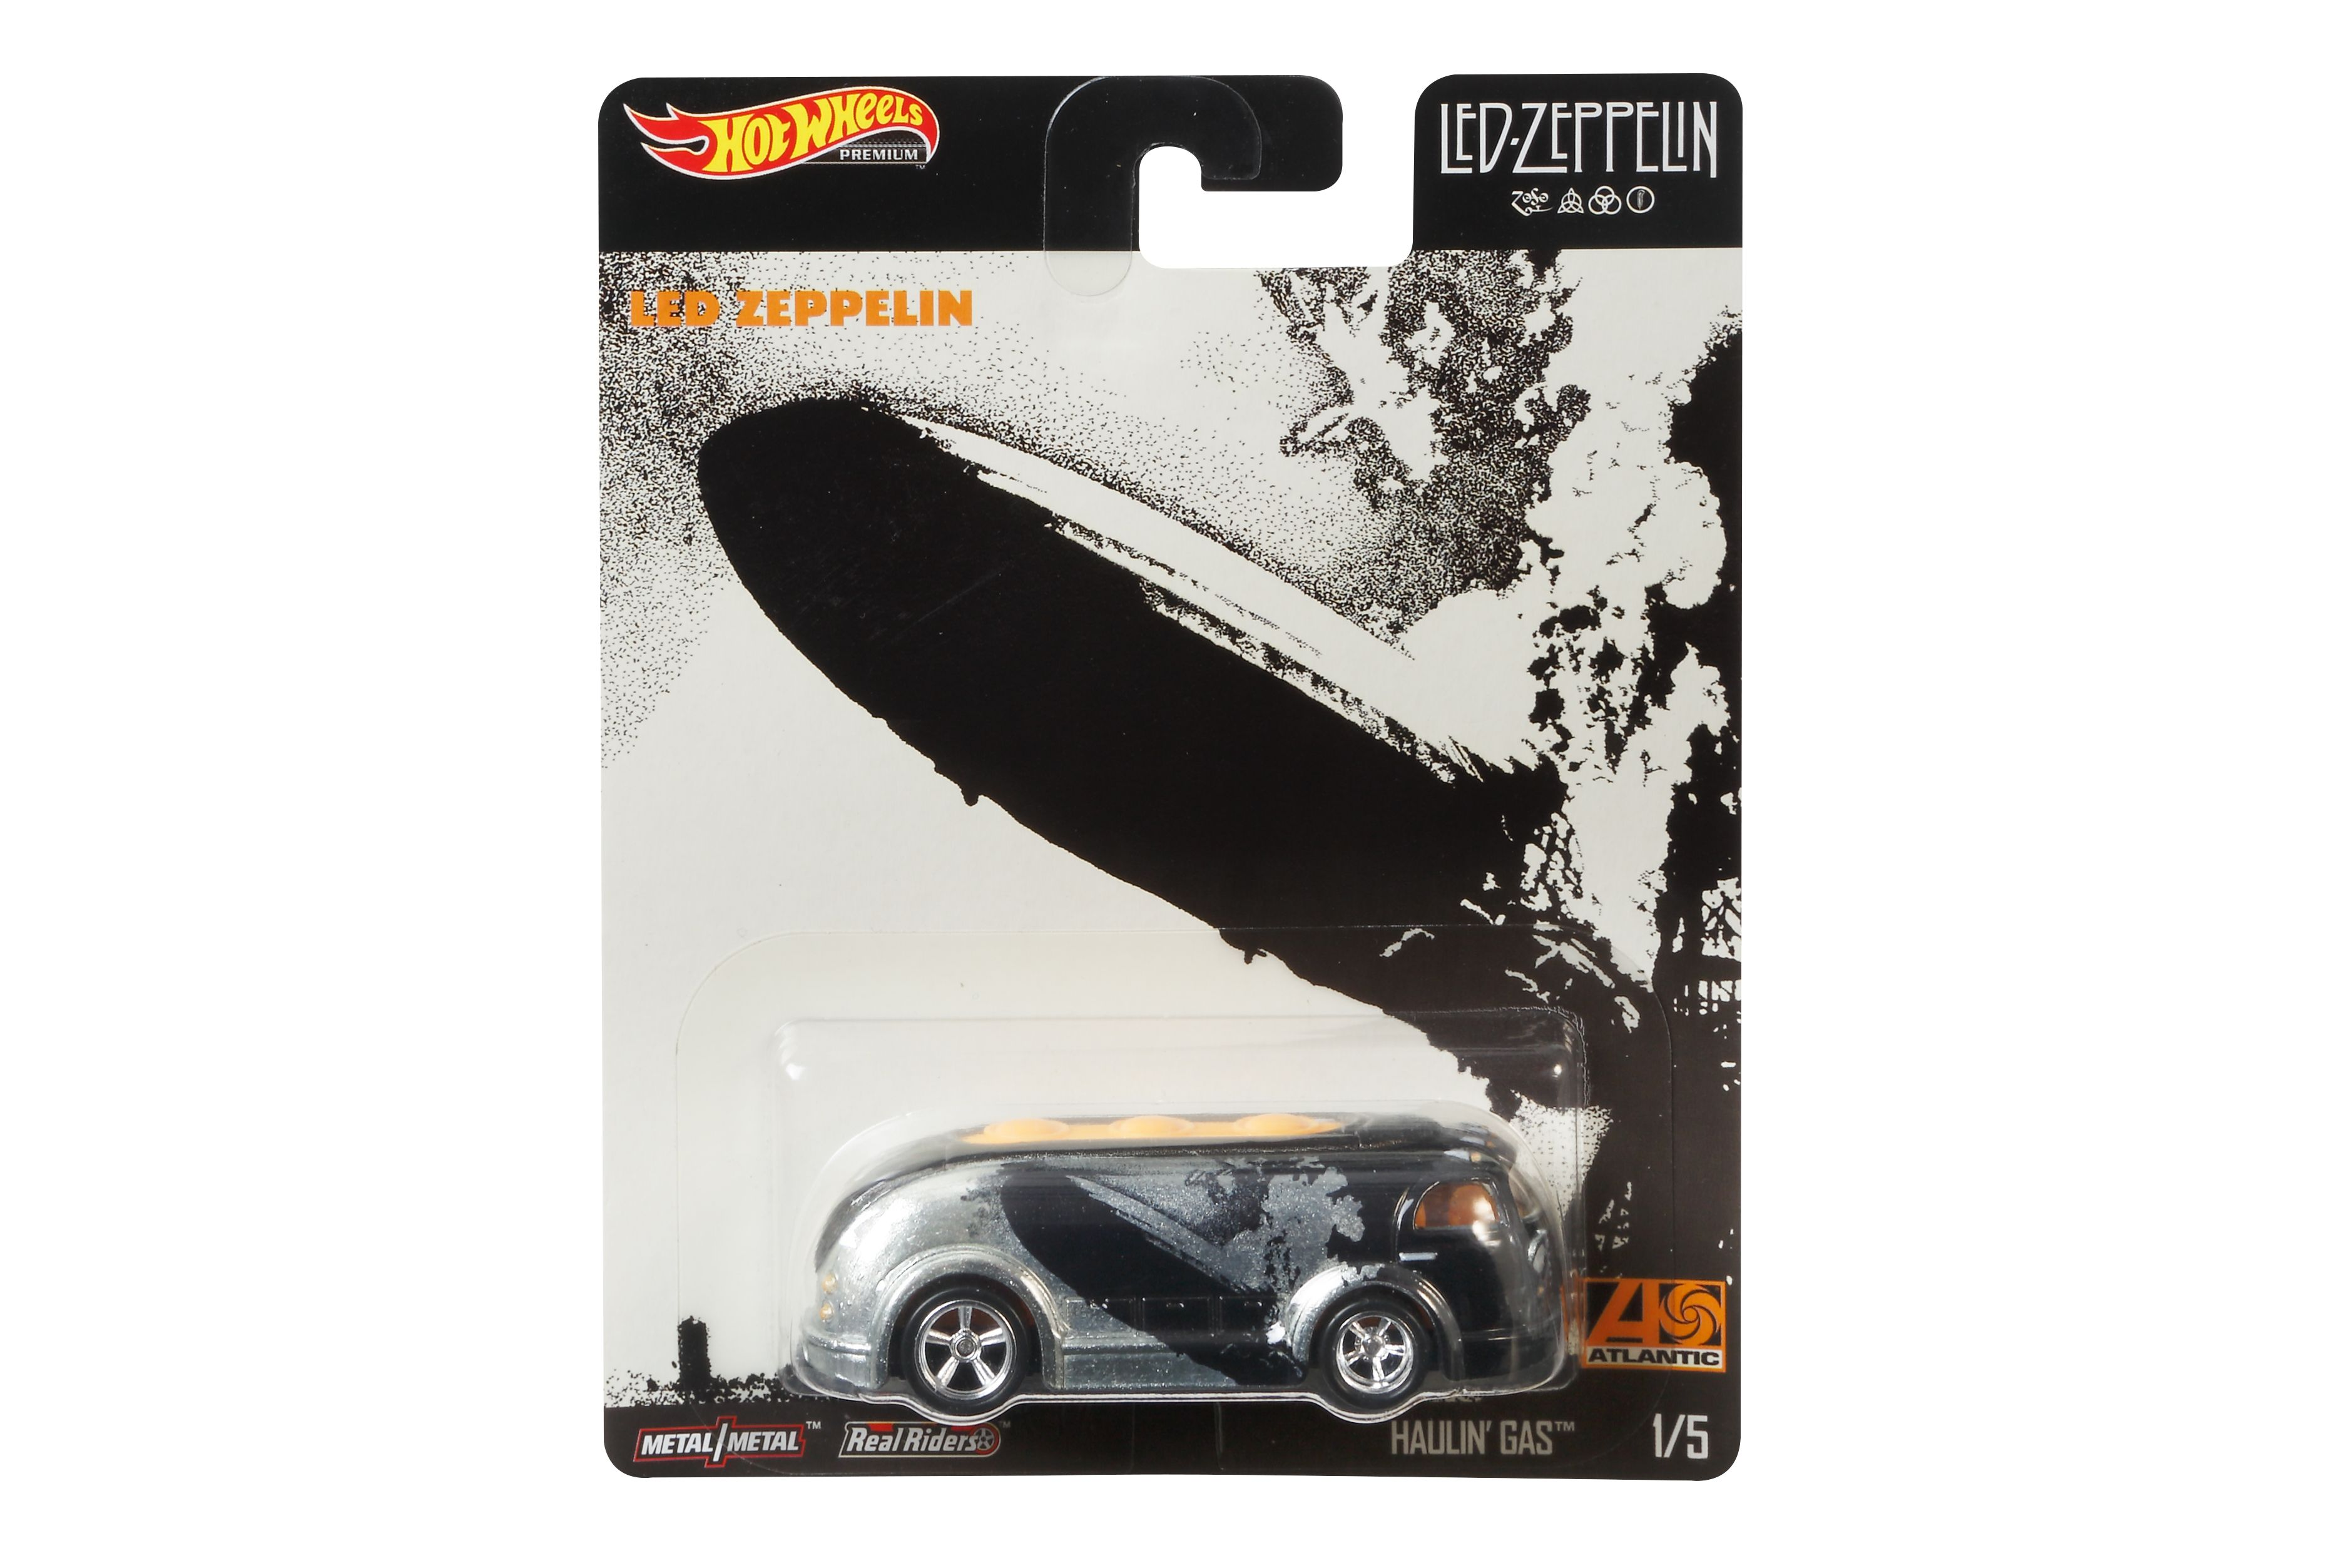 Hot Wheels Led Zeppelin Series Blimp HAULIN/' GAS  w// Real Riders